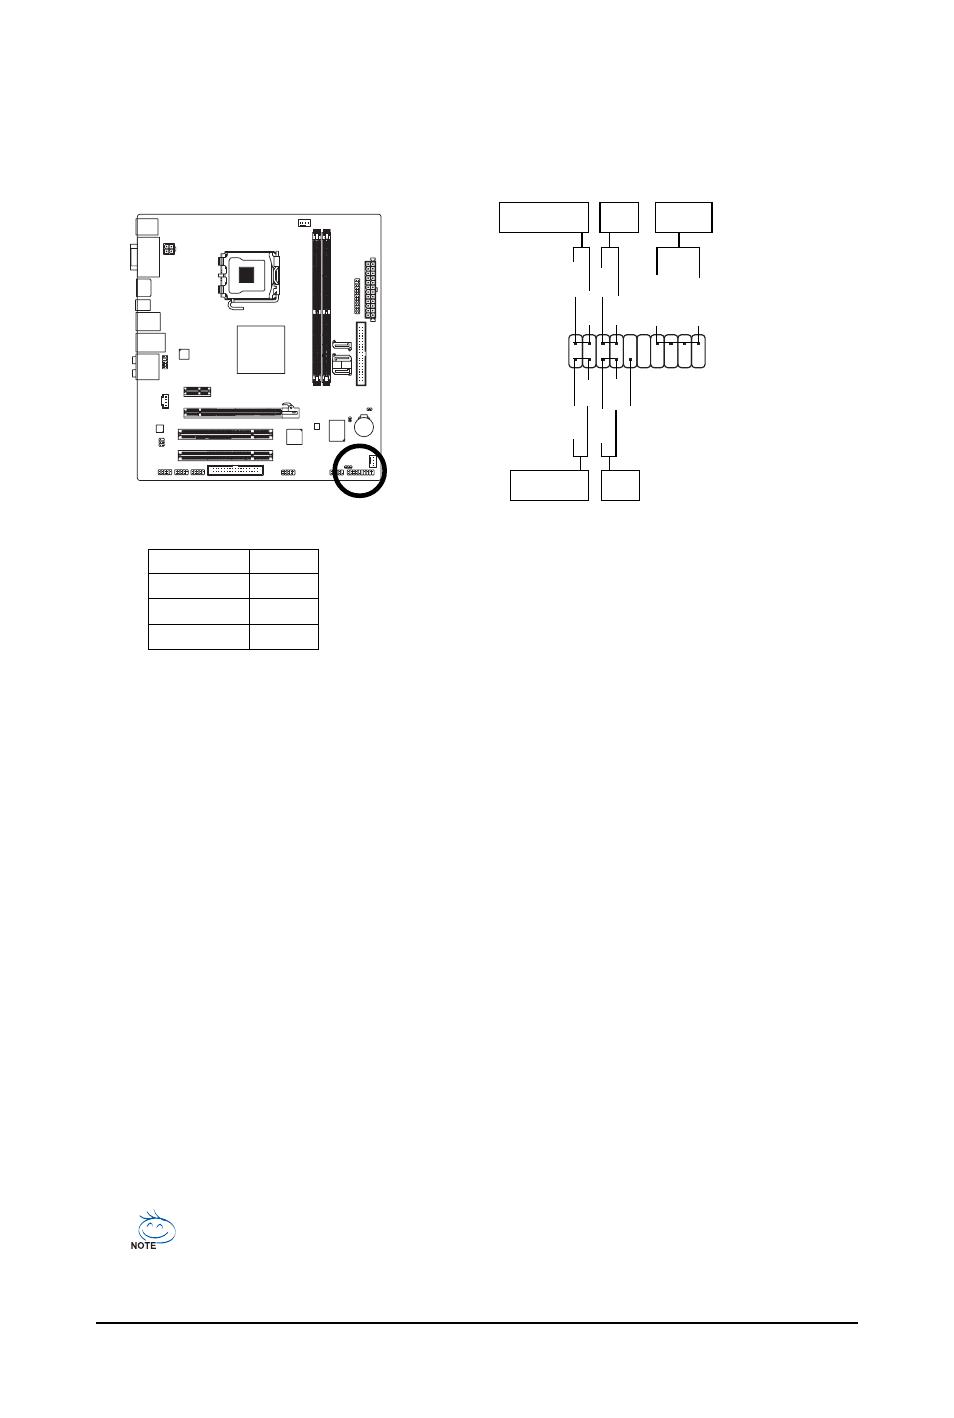 10) f_panel (front panel header) | GIGABYTE LGA775 Socket Motherboard for  Intel GA-73PVM-S2H User Manual | Page 28 / 100